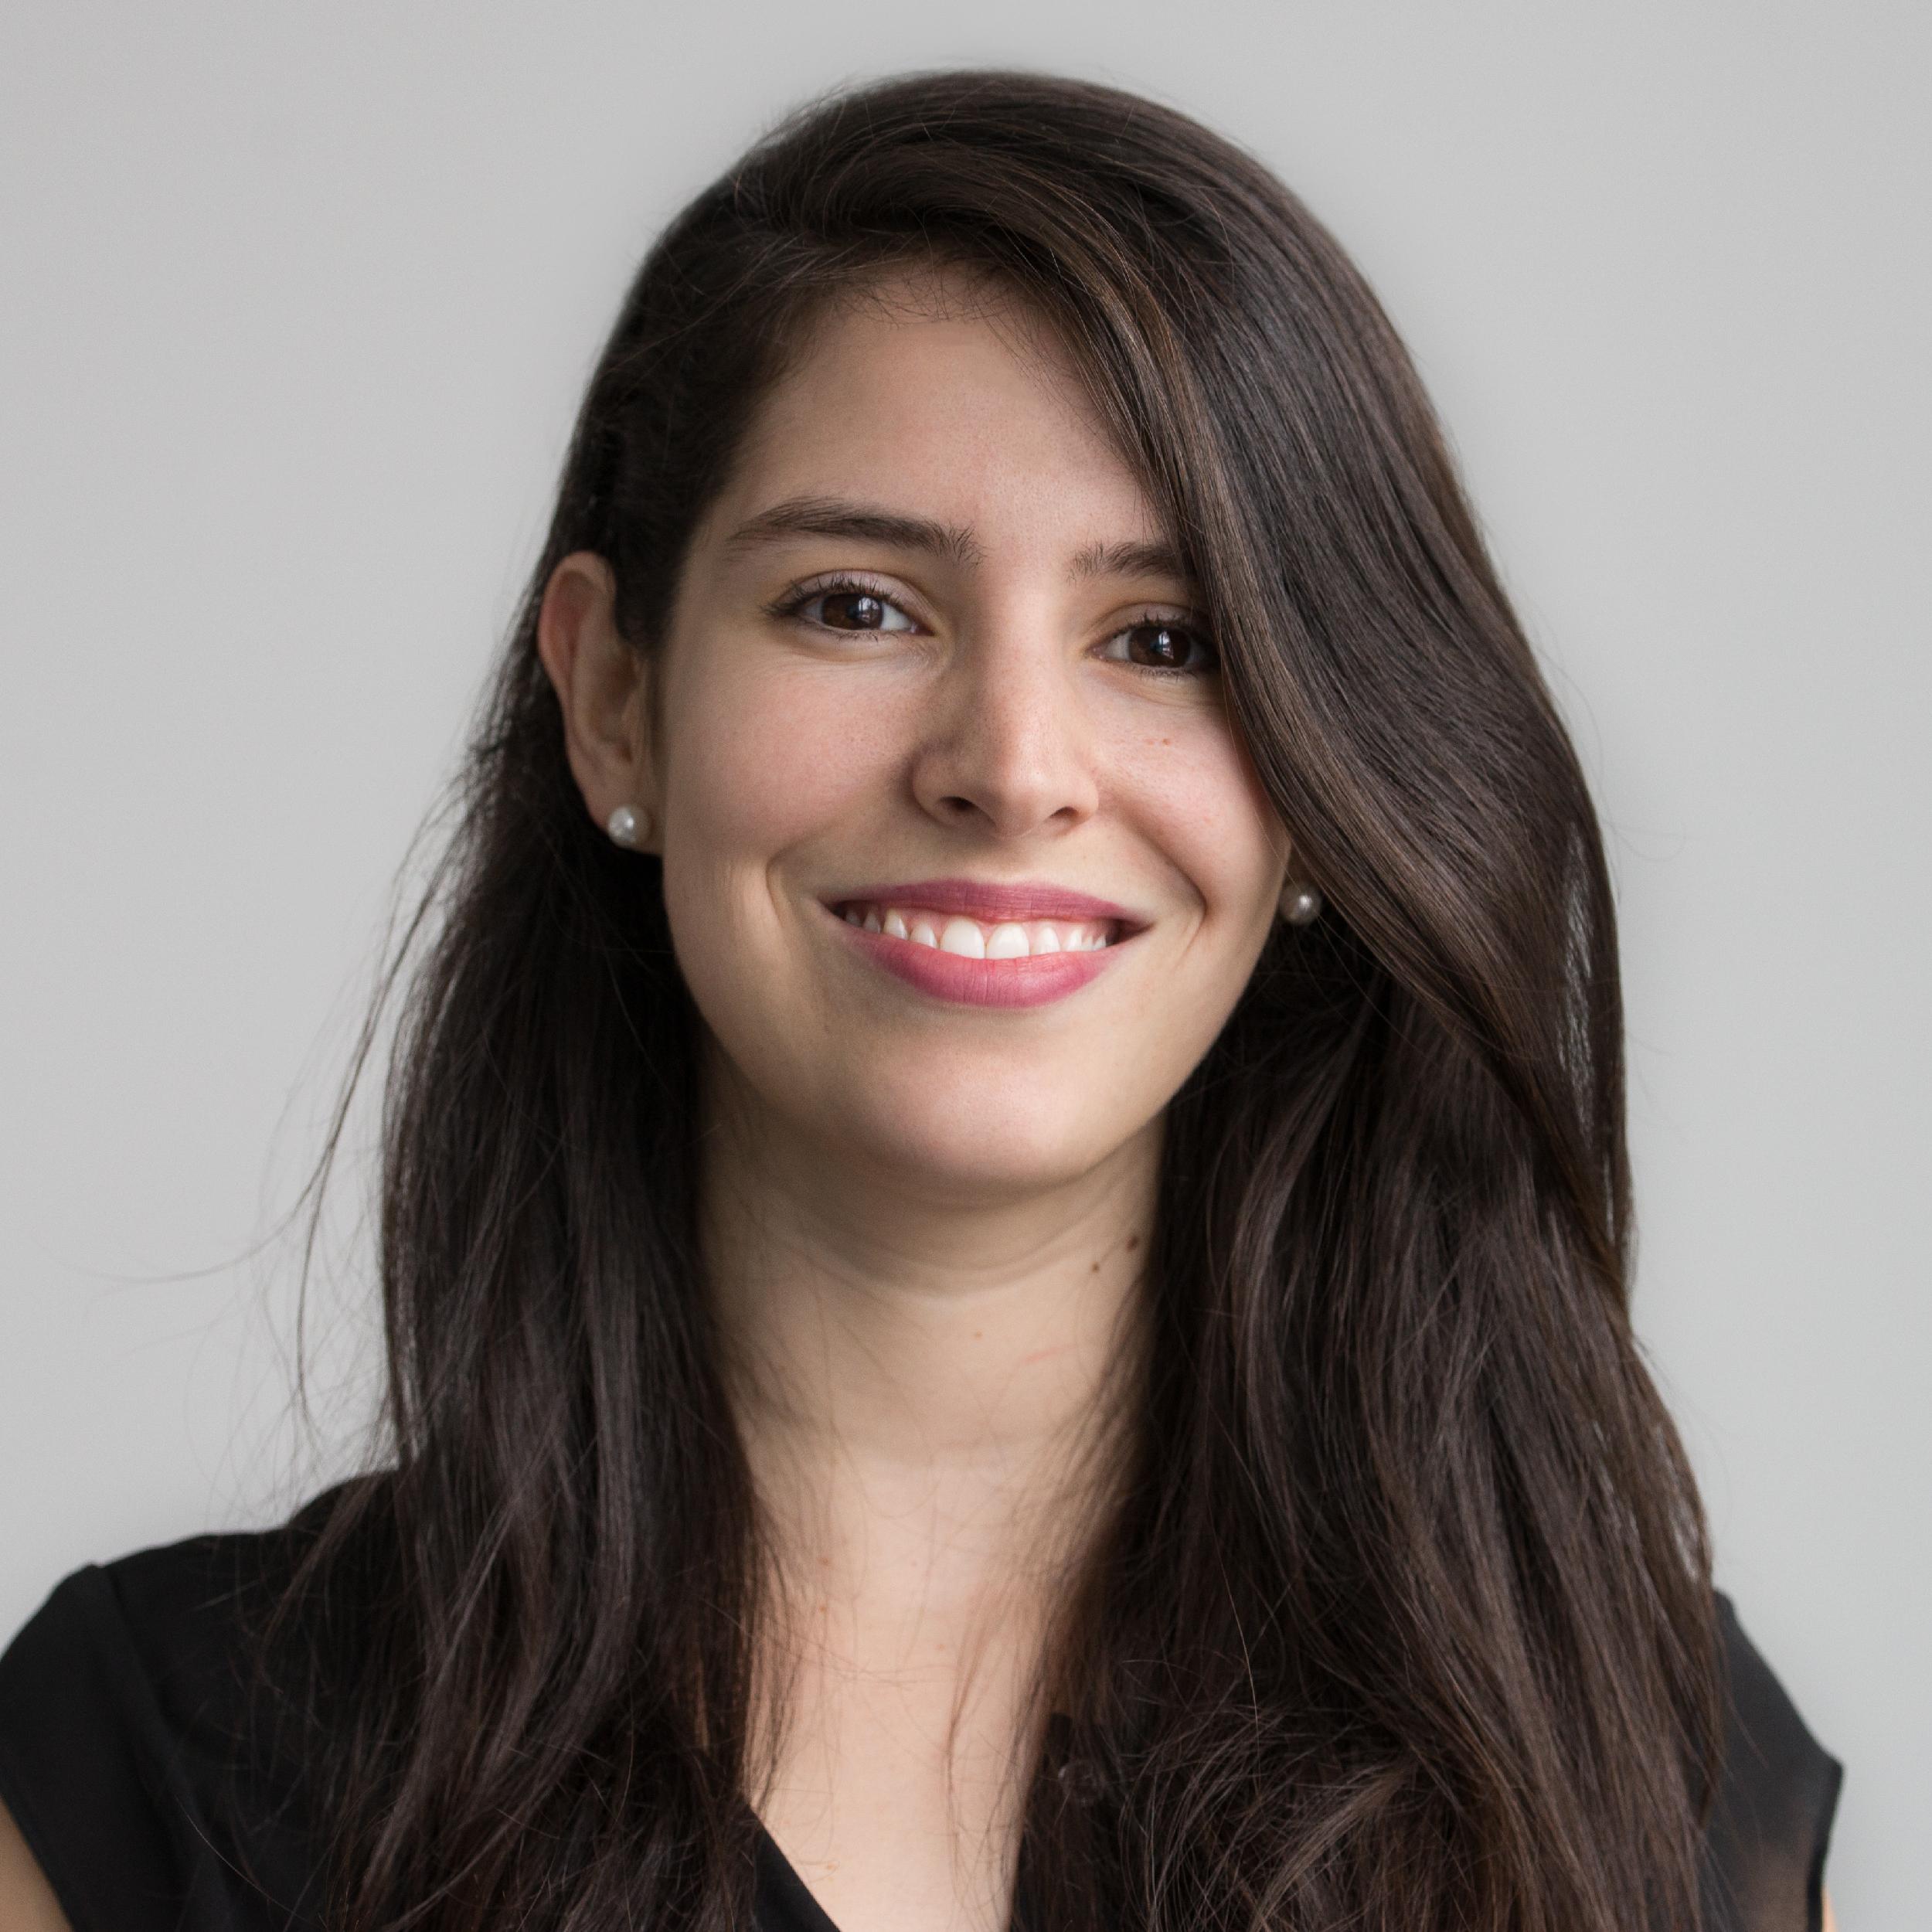 Sofia Zuniga